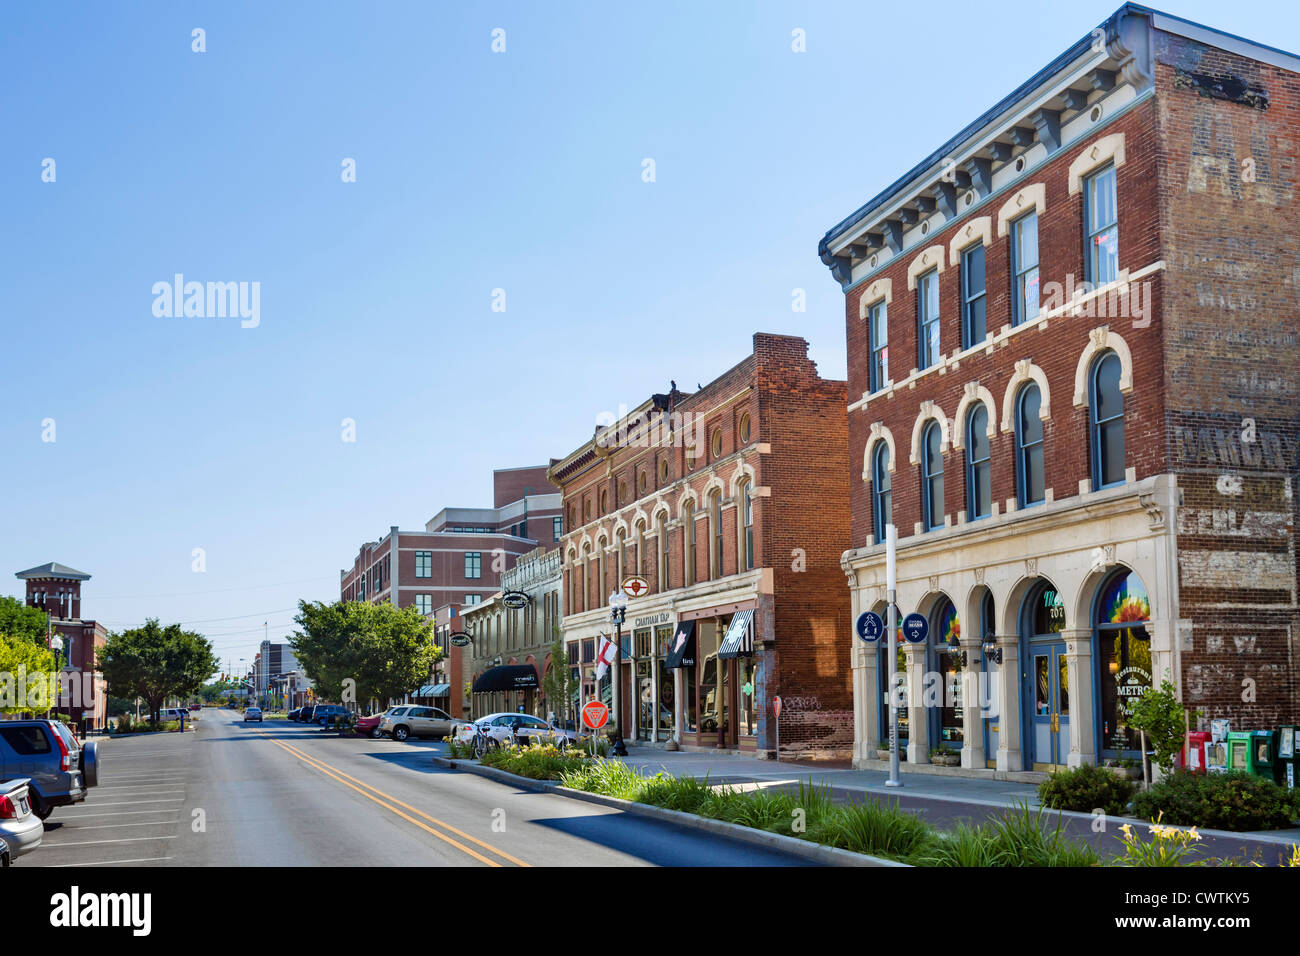 Historic buildings on Massachusetts Avenue, Indianapolis, Indiana, USA - Stock Image